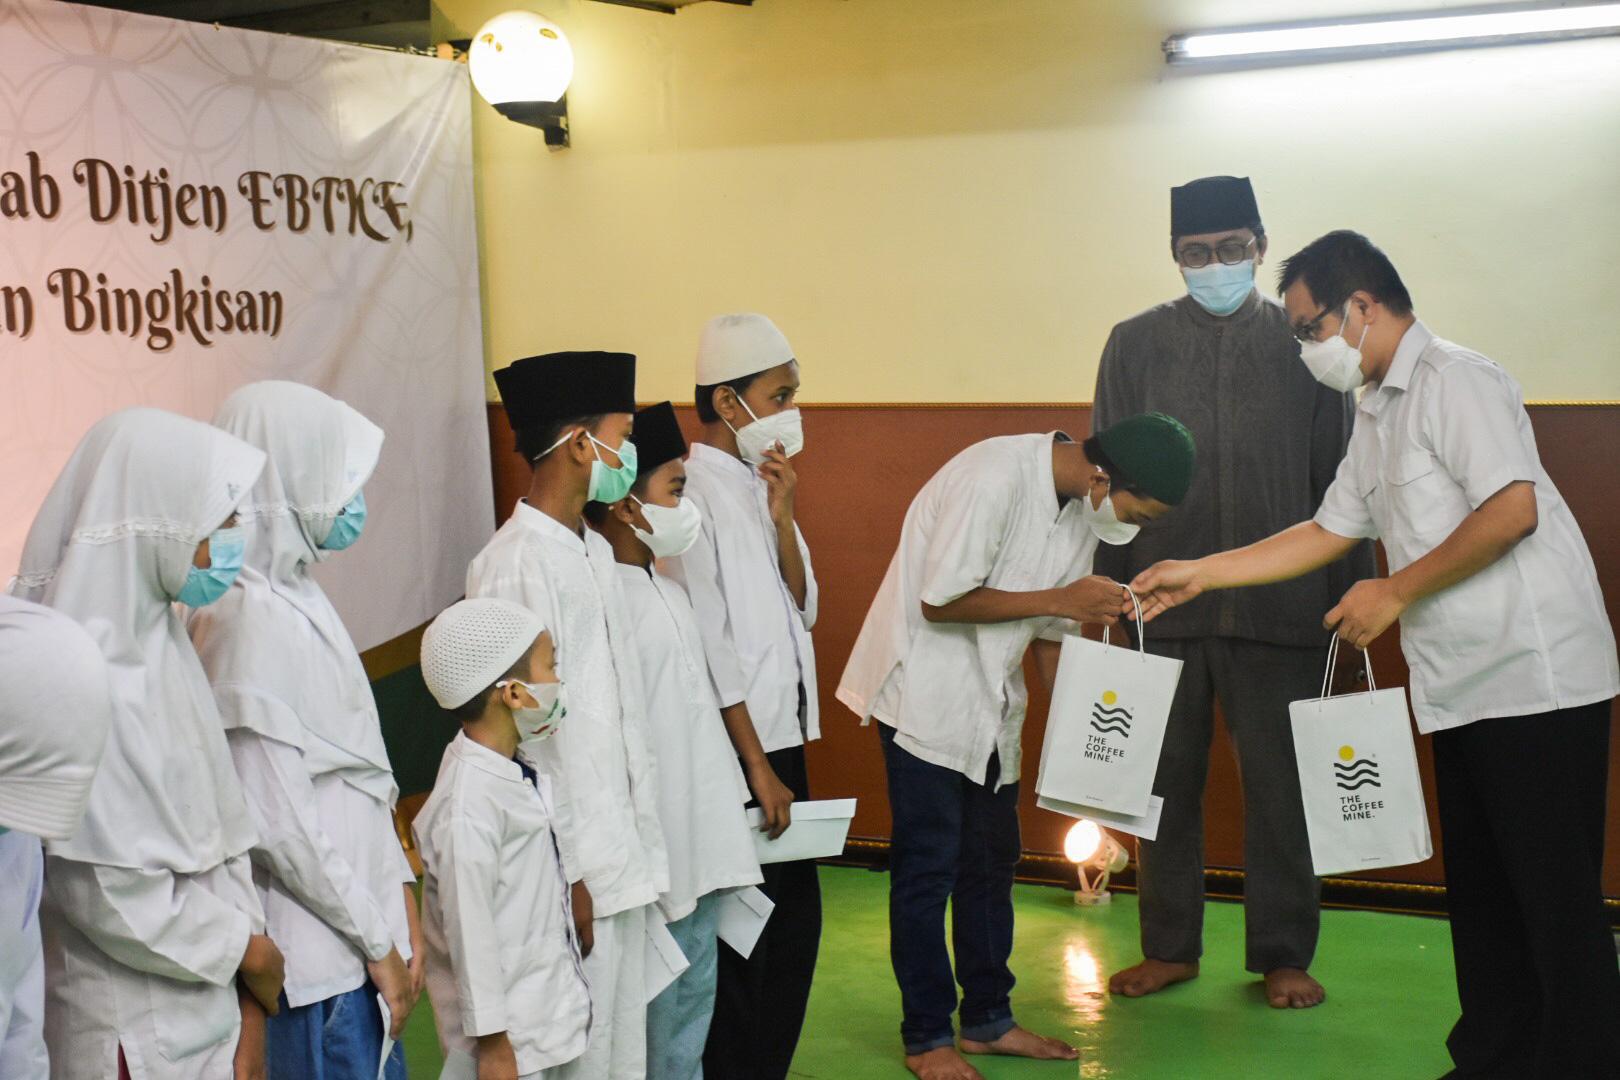 Pada kesempatan ini Ditjen EBTKE juga mambagikan santunan kepada anak yatim yang berjumlah 50 anak yang tinggal di sekitar Lingkungan kantor Ditjen EBTKE, Jakarta (05/05/2021) (NS)